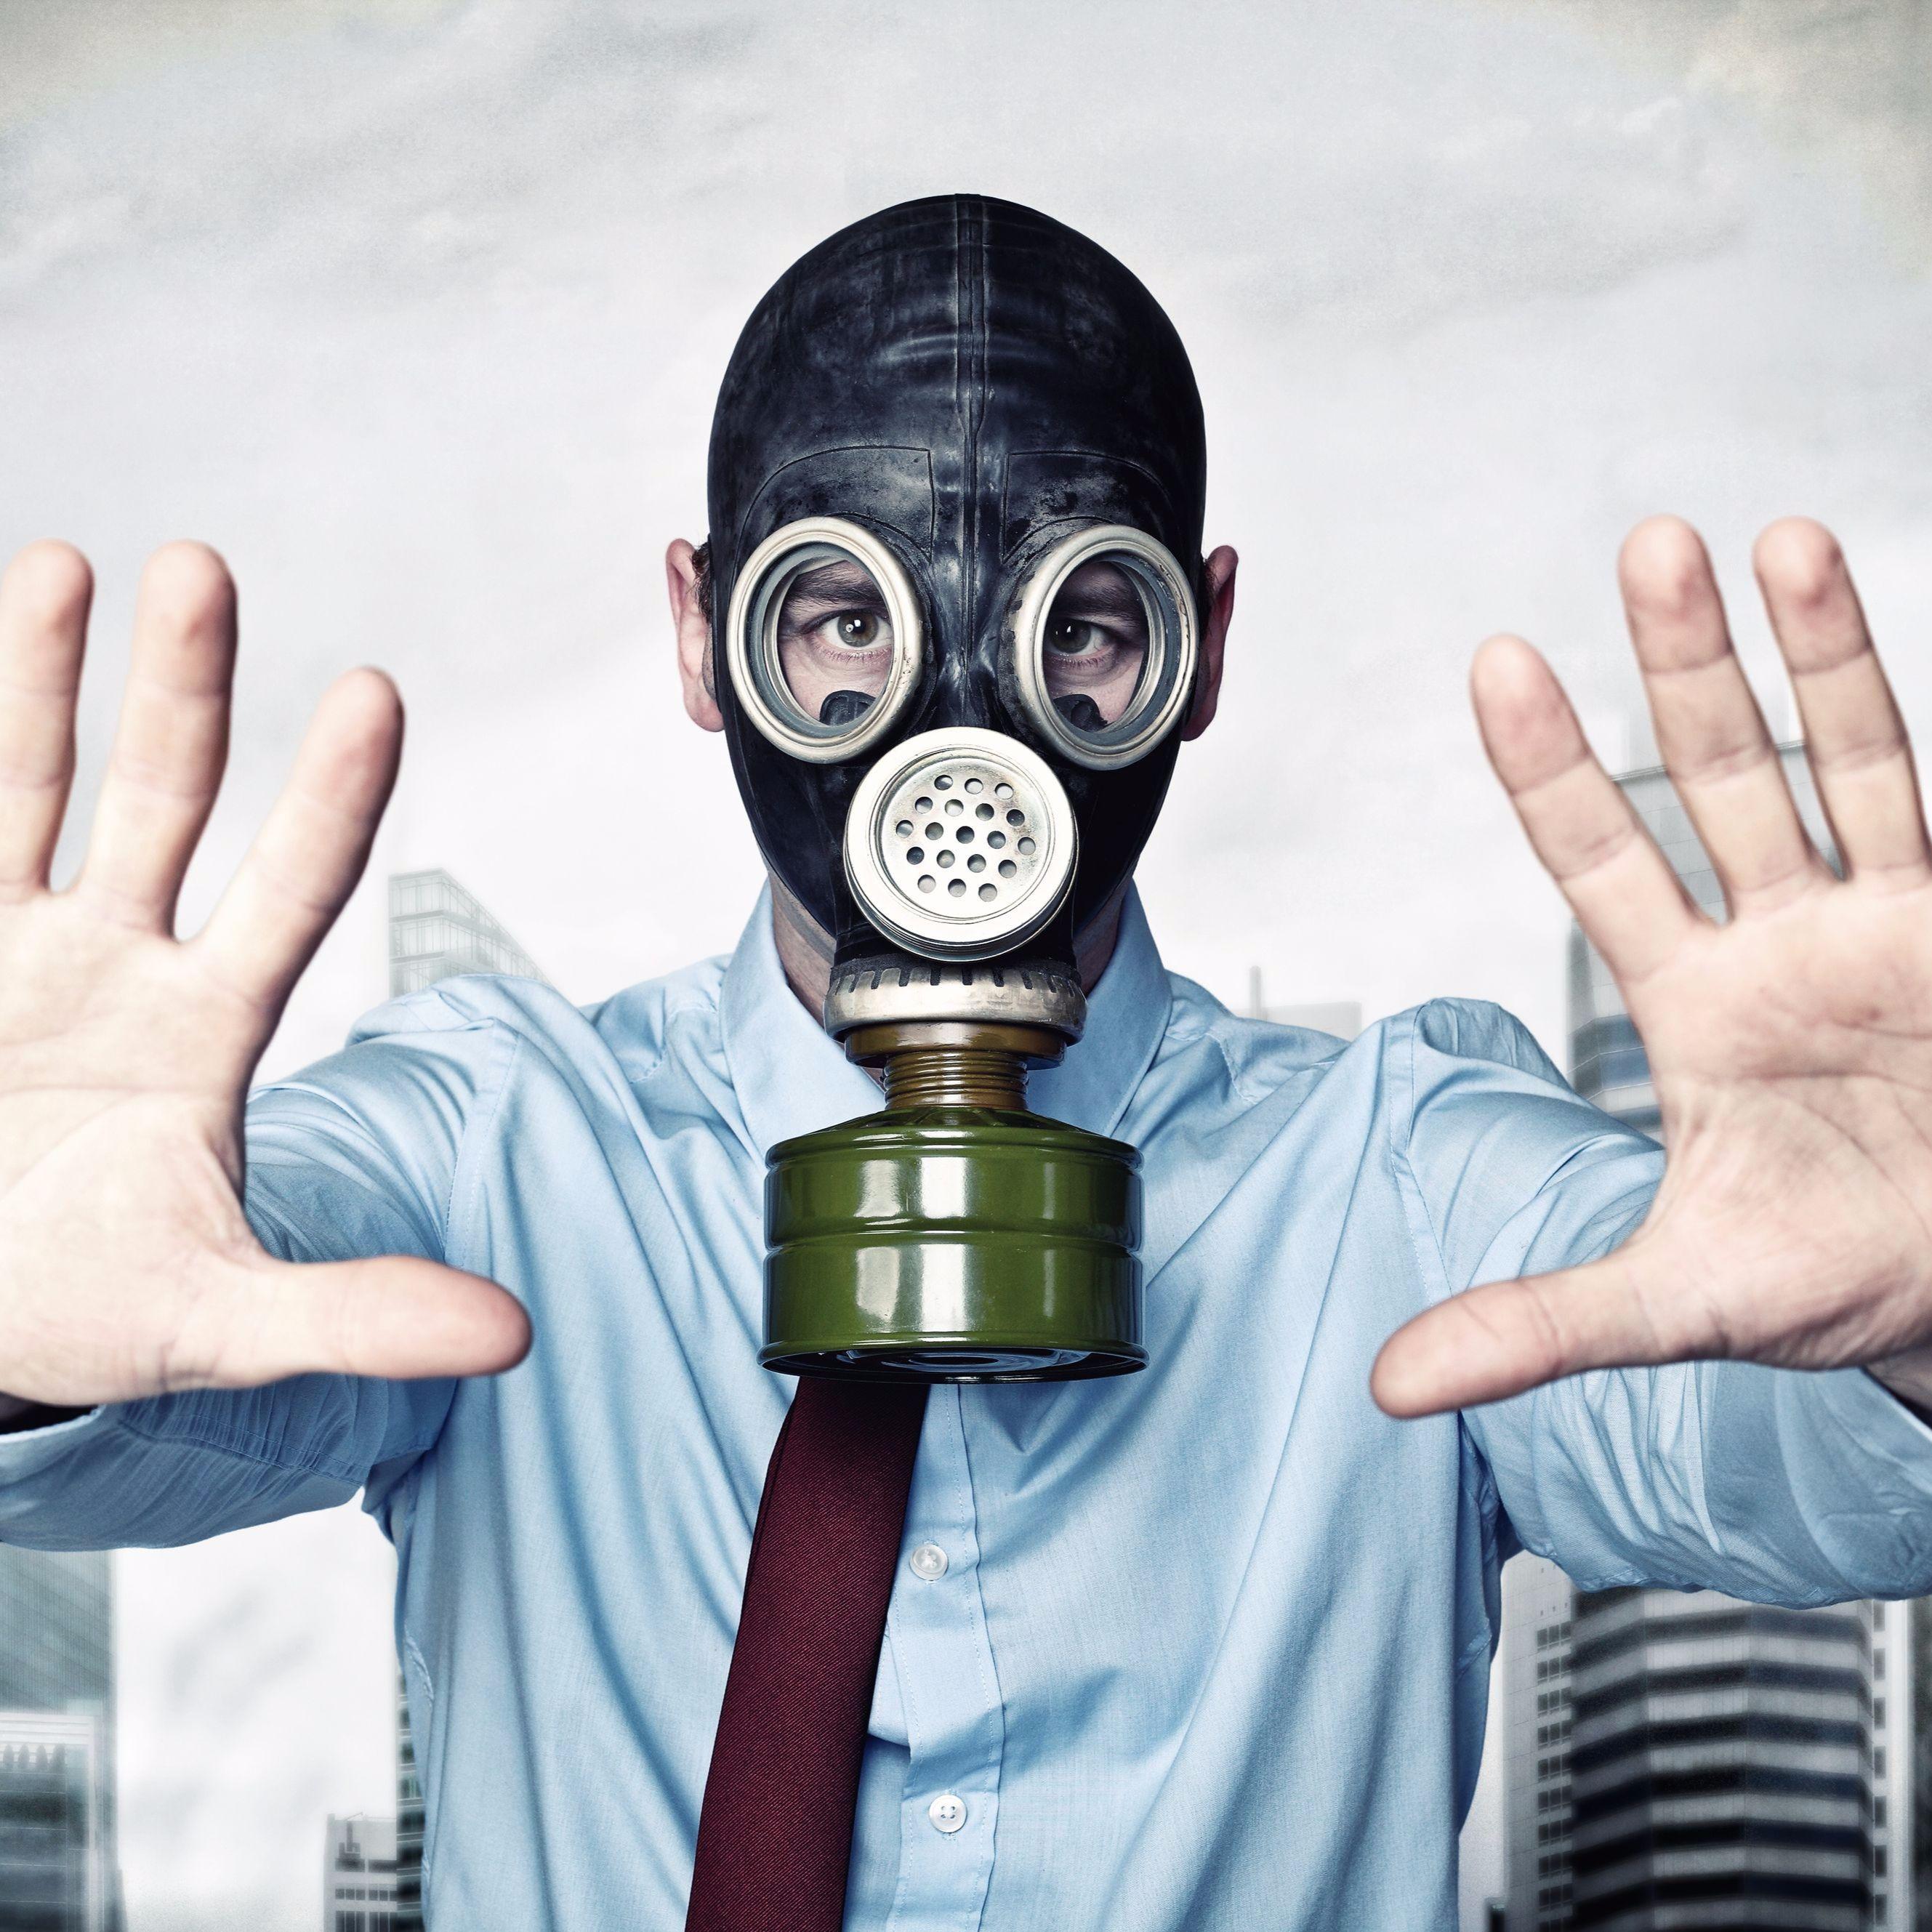 5. Toxic Employees